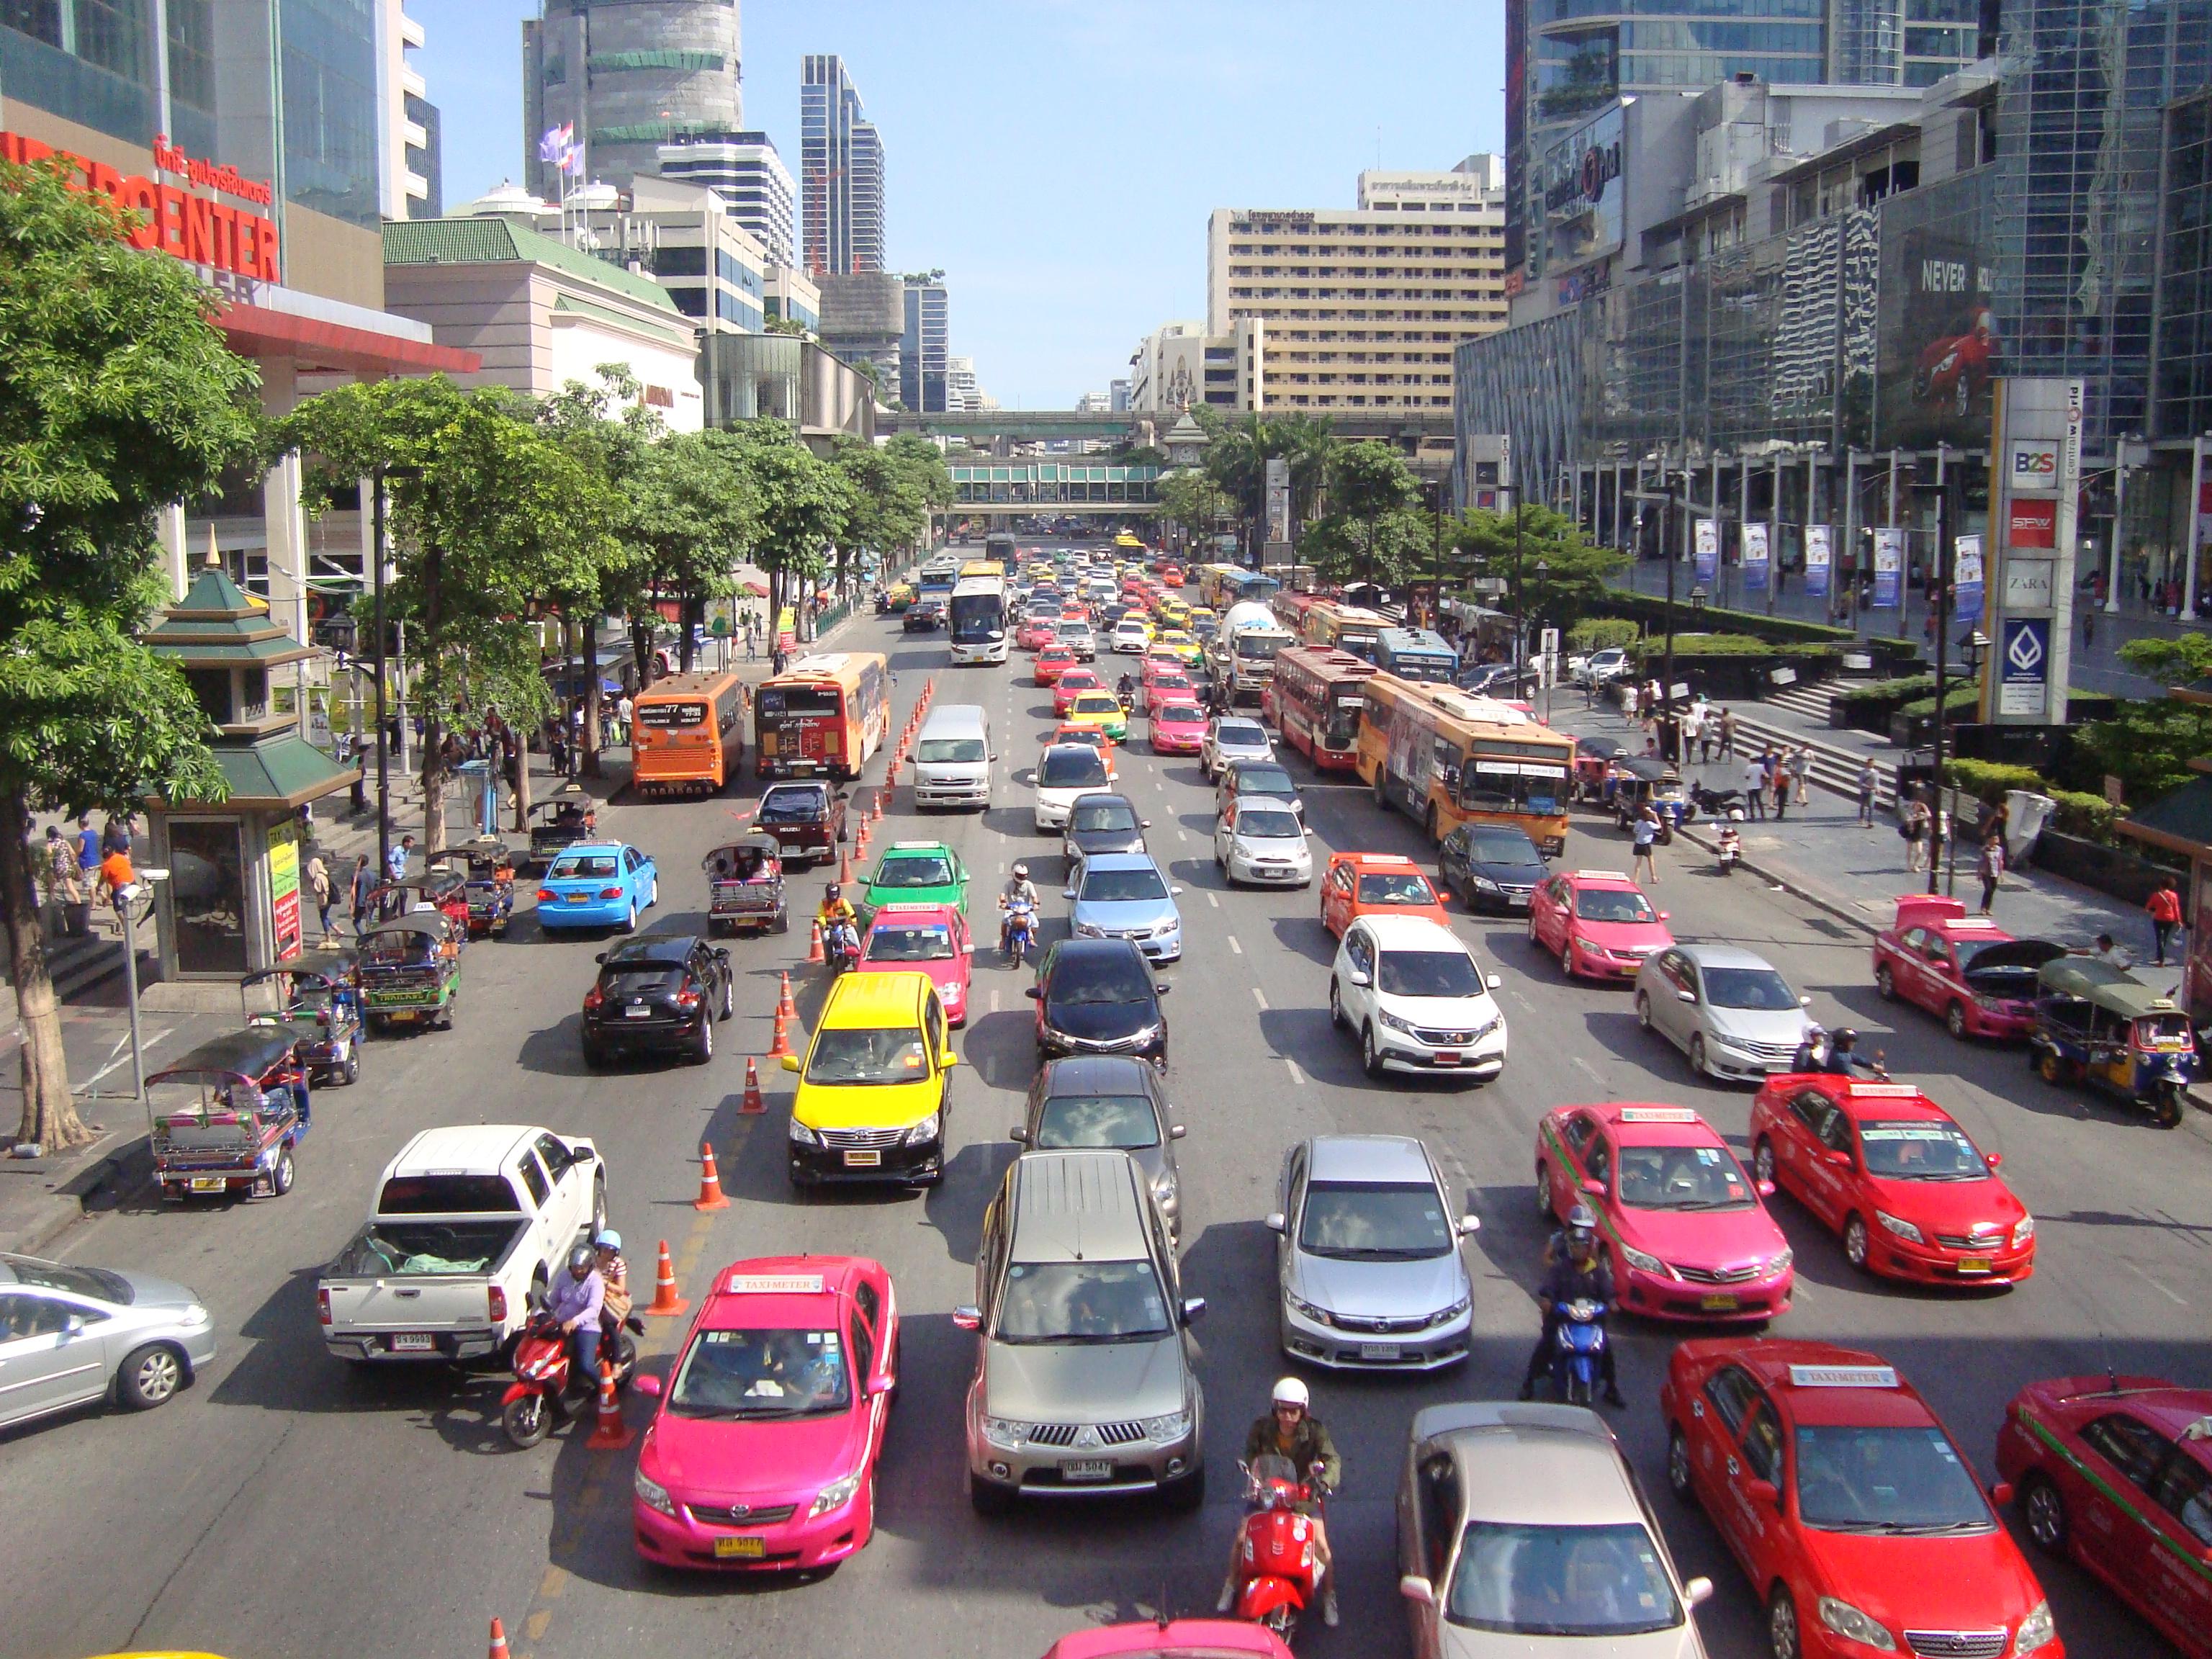 File:Traffic jam Bangkok.JPG - Wikimedia Commons